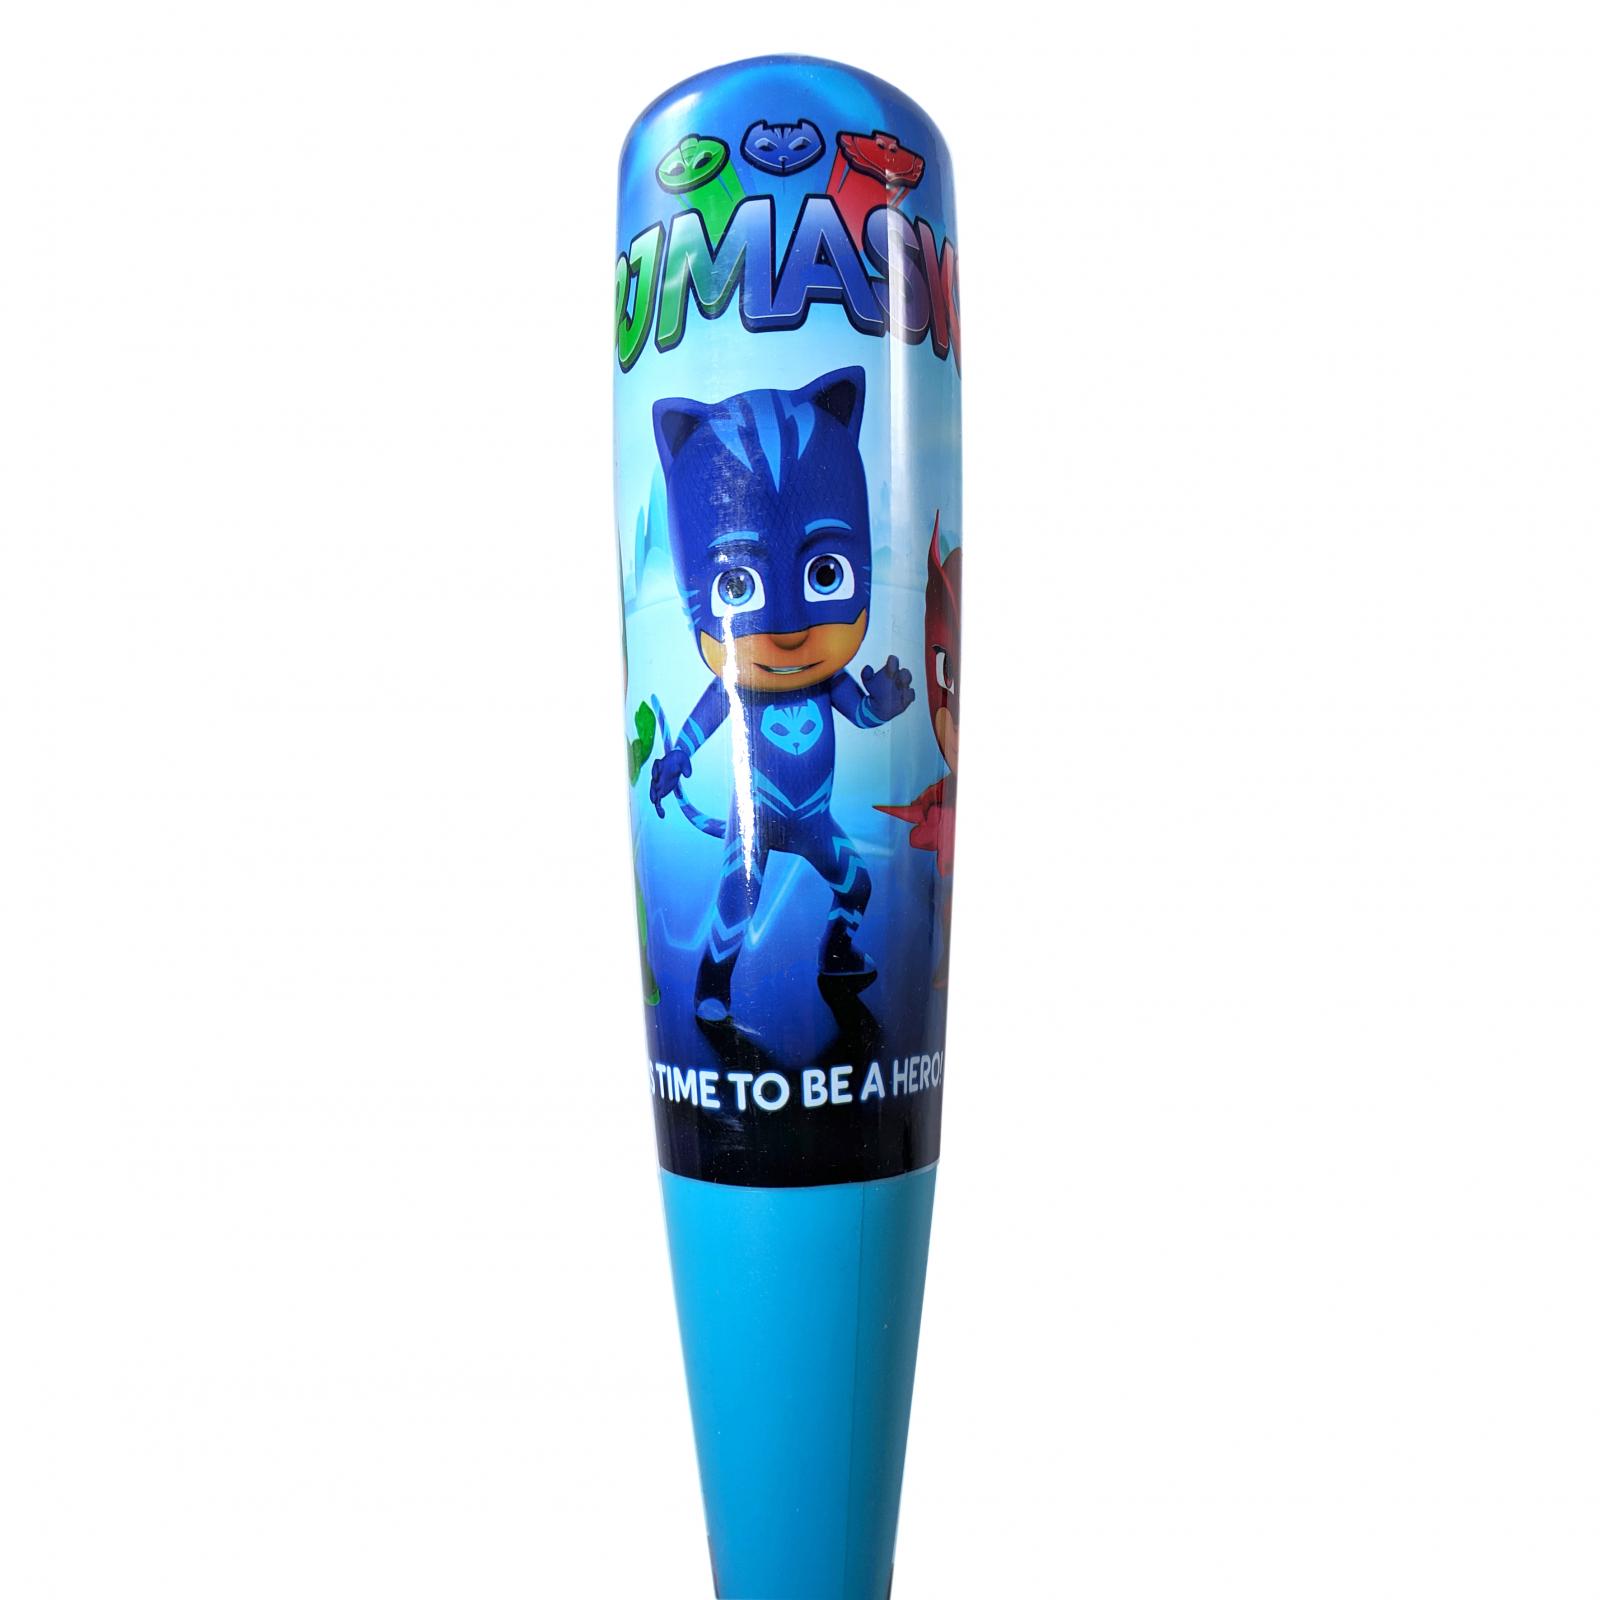 Disney PJ Masks Baseball and Bat Toy Set